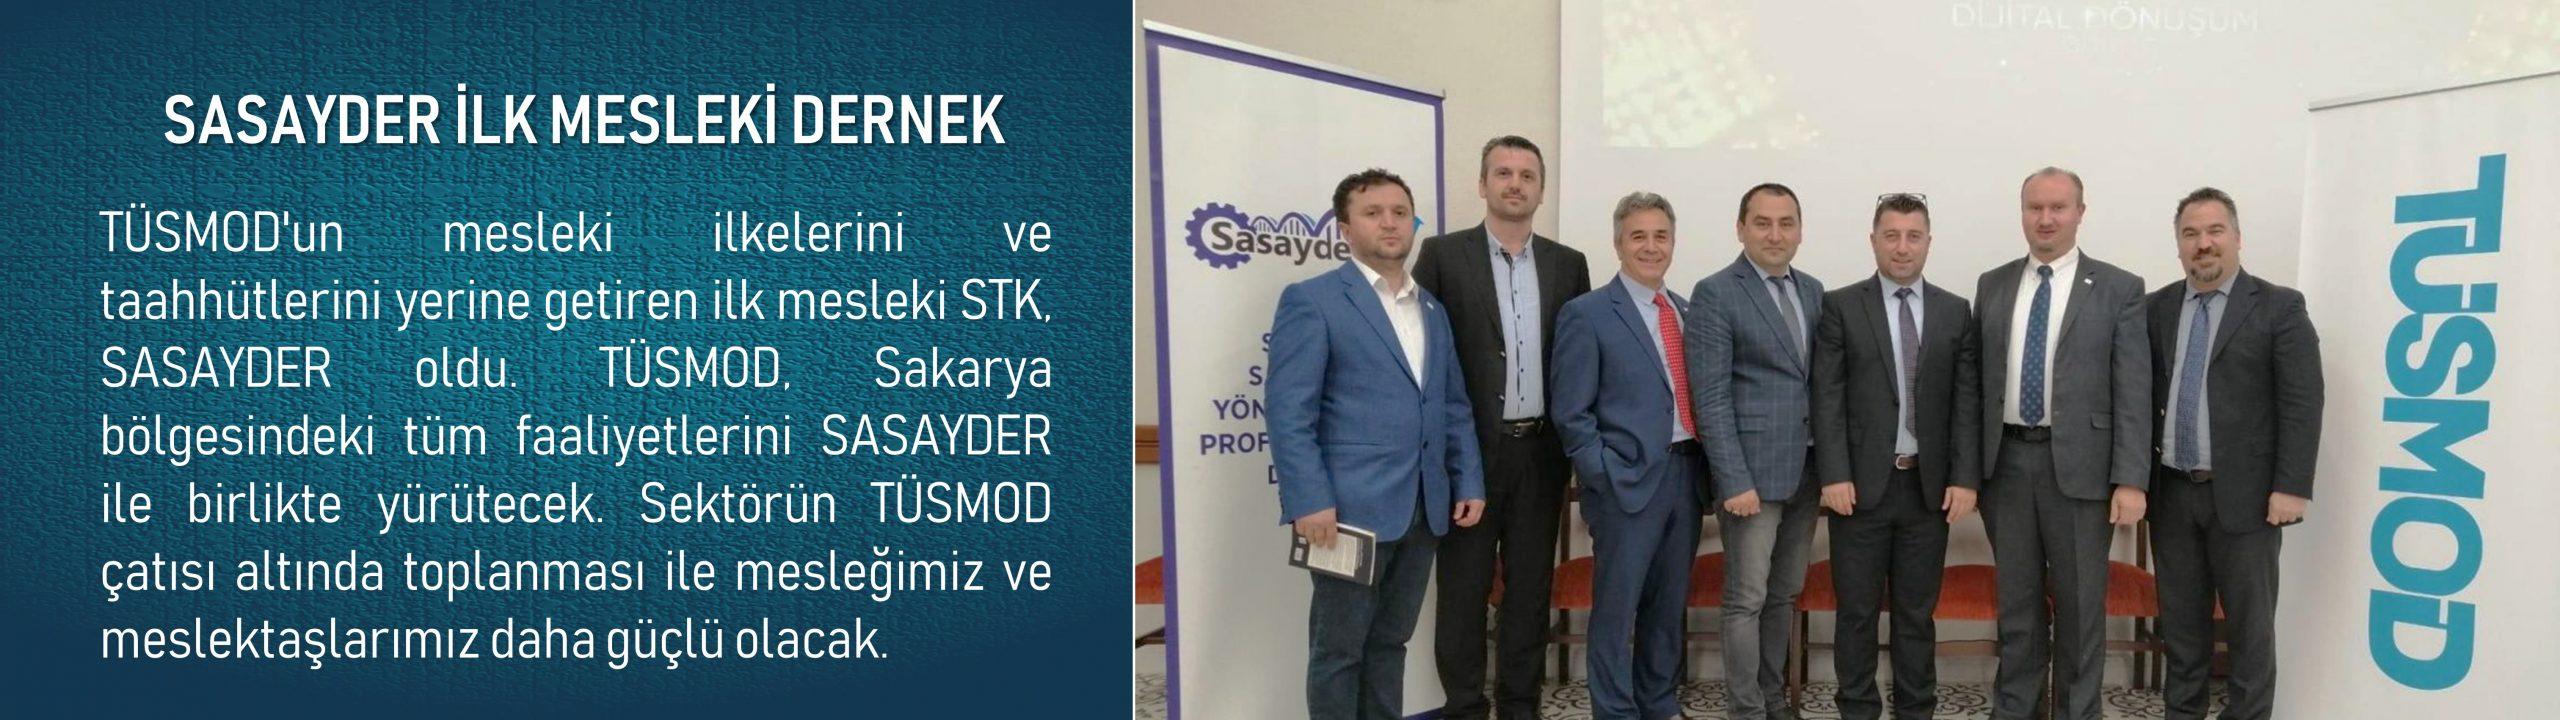 Sasayder